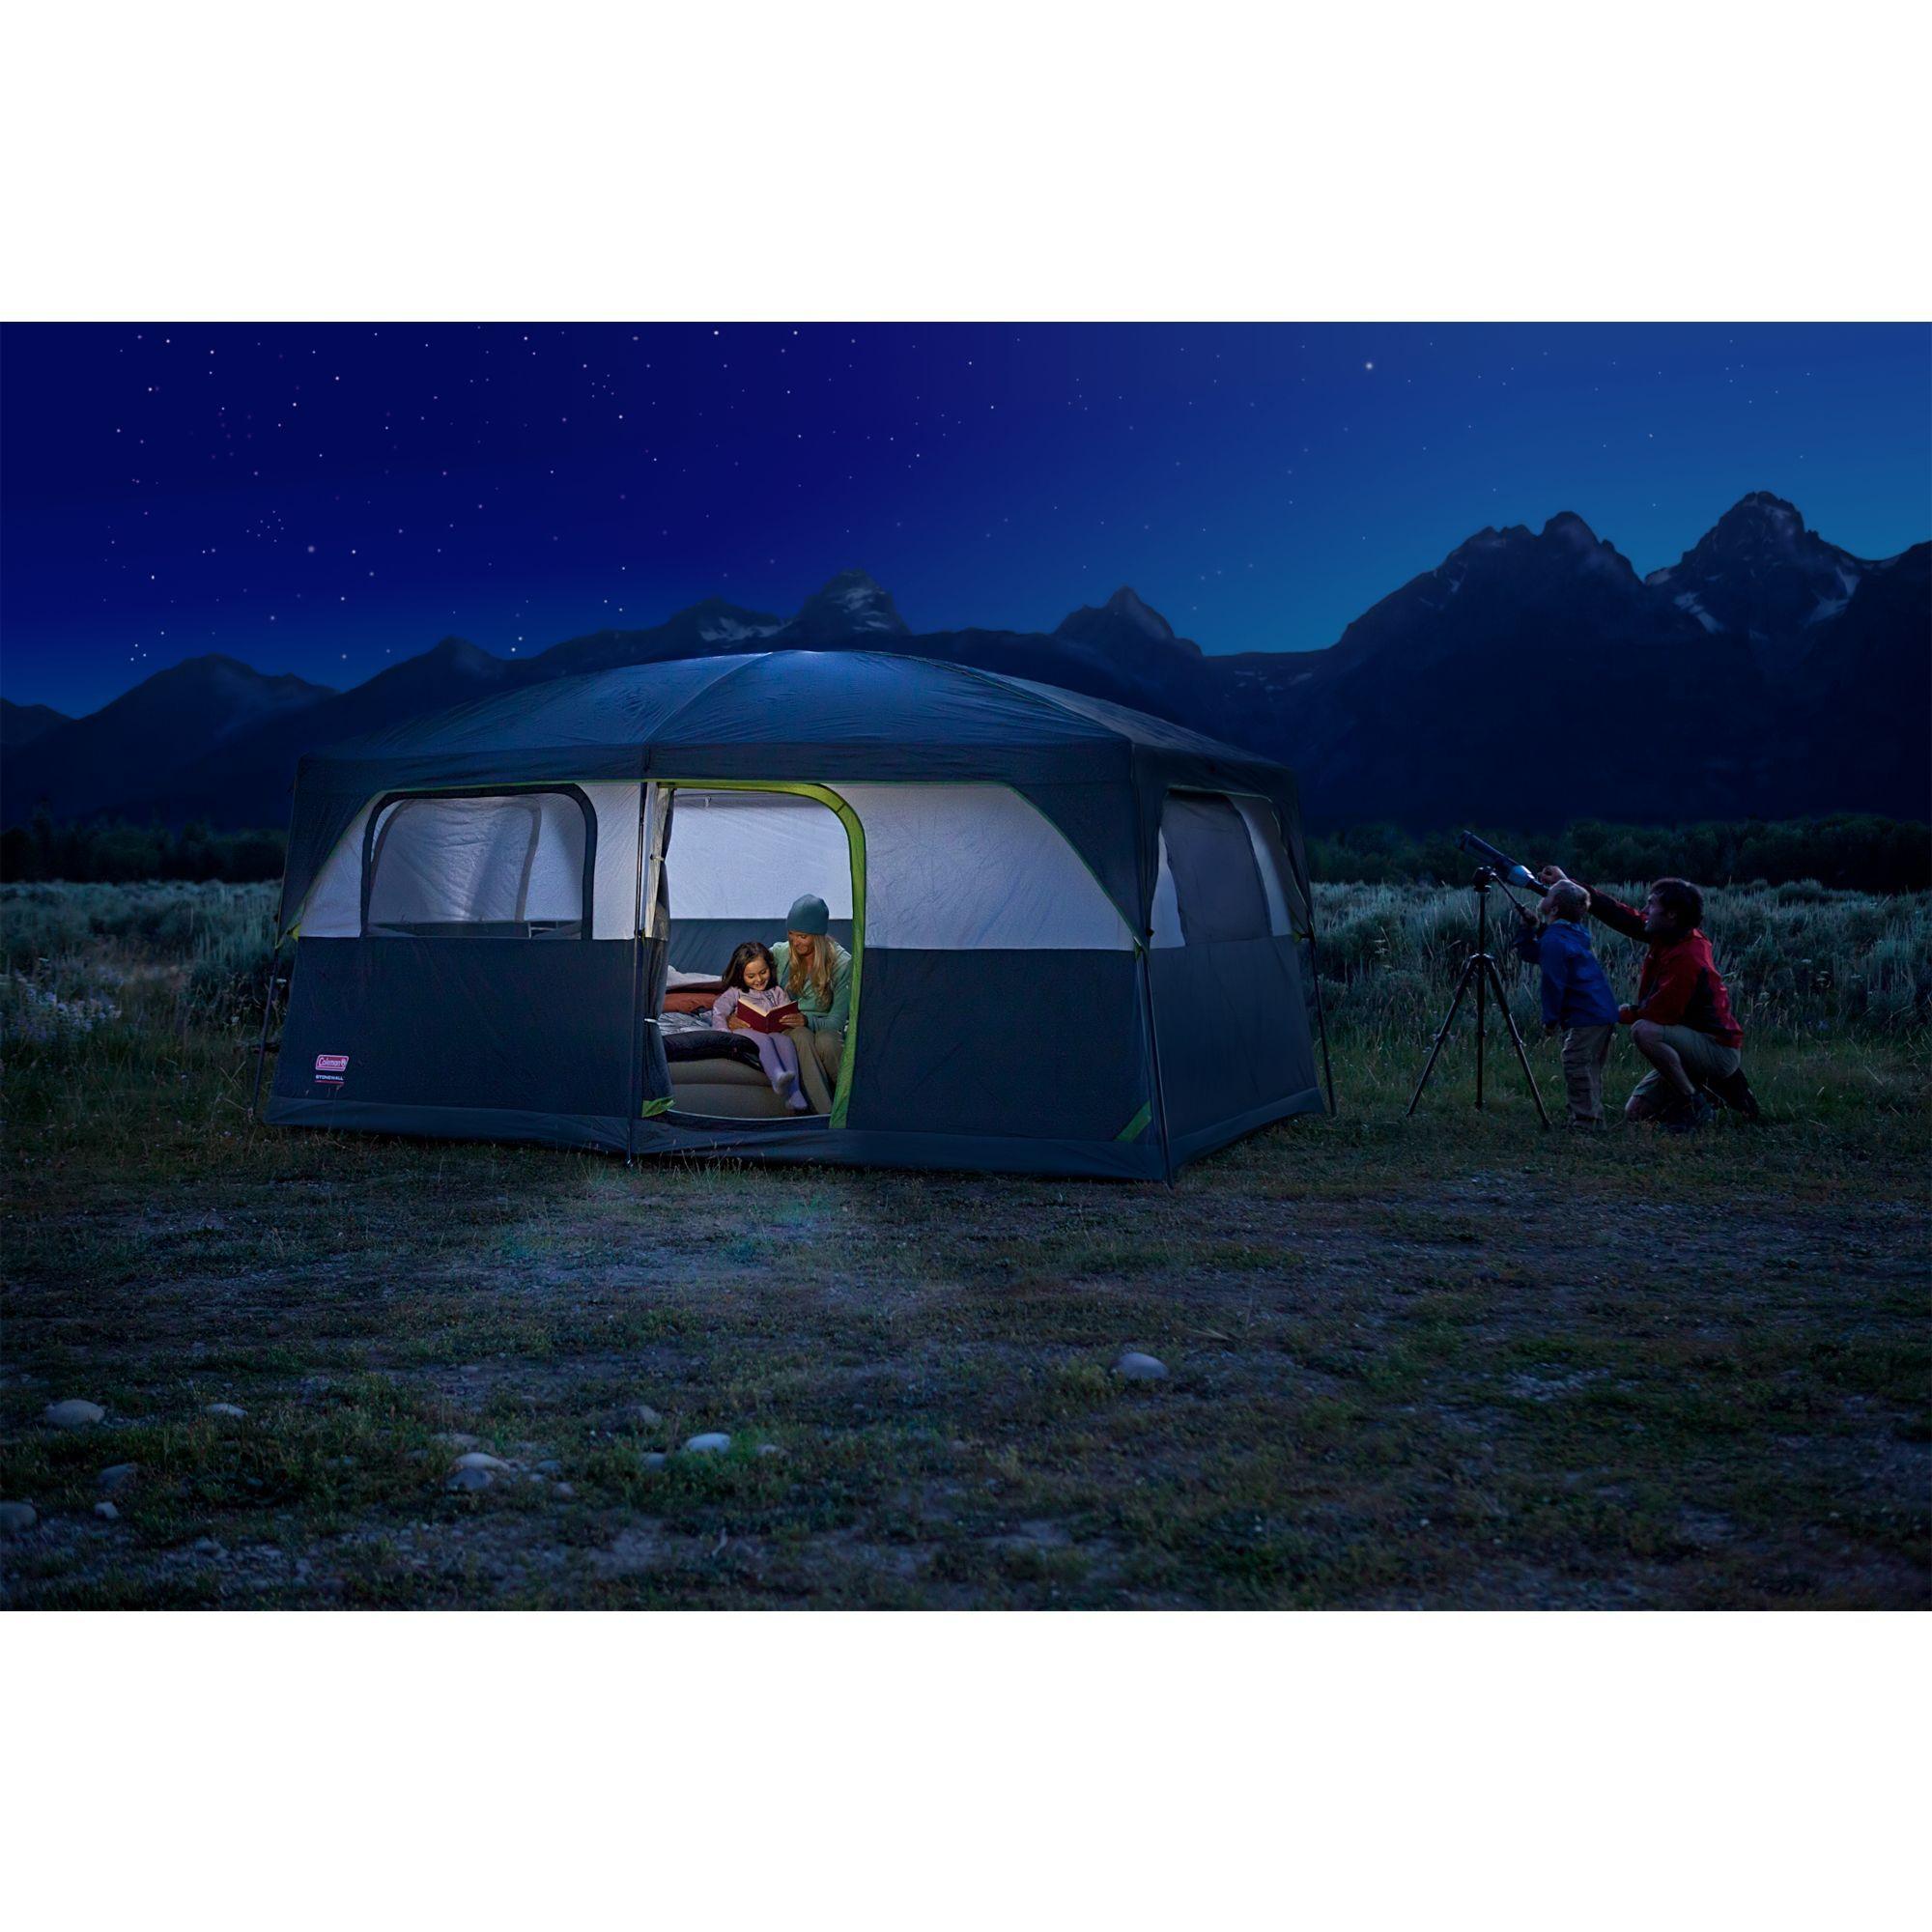 Signature Prairie Breeze™ 9Person Tent Tent, Cabin tent